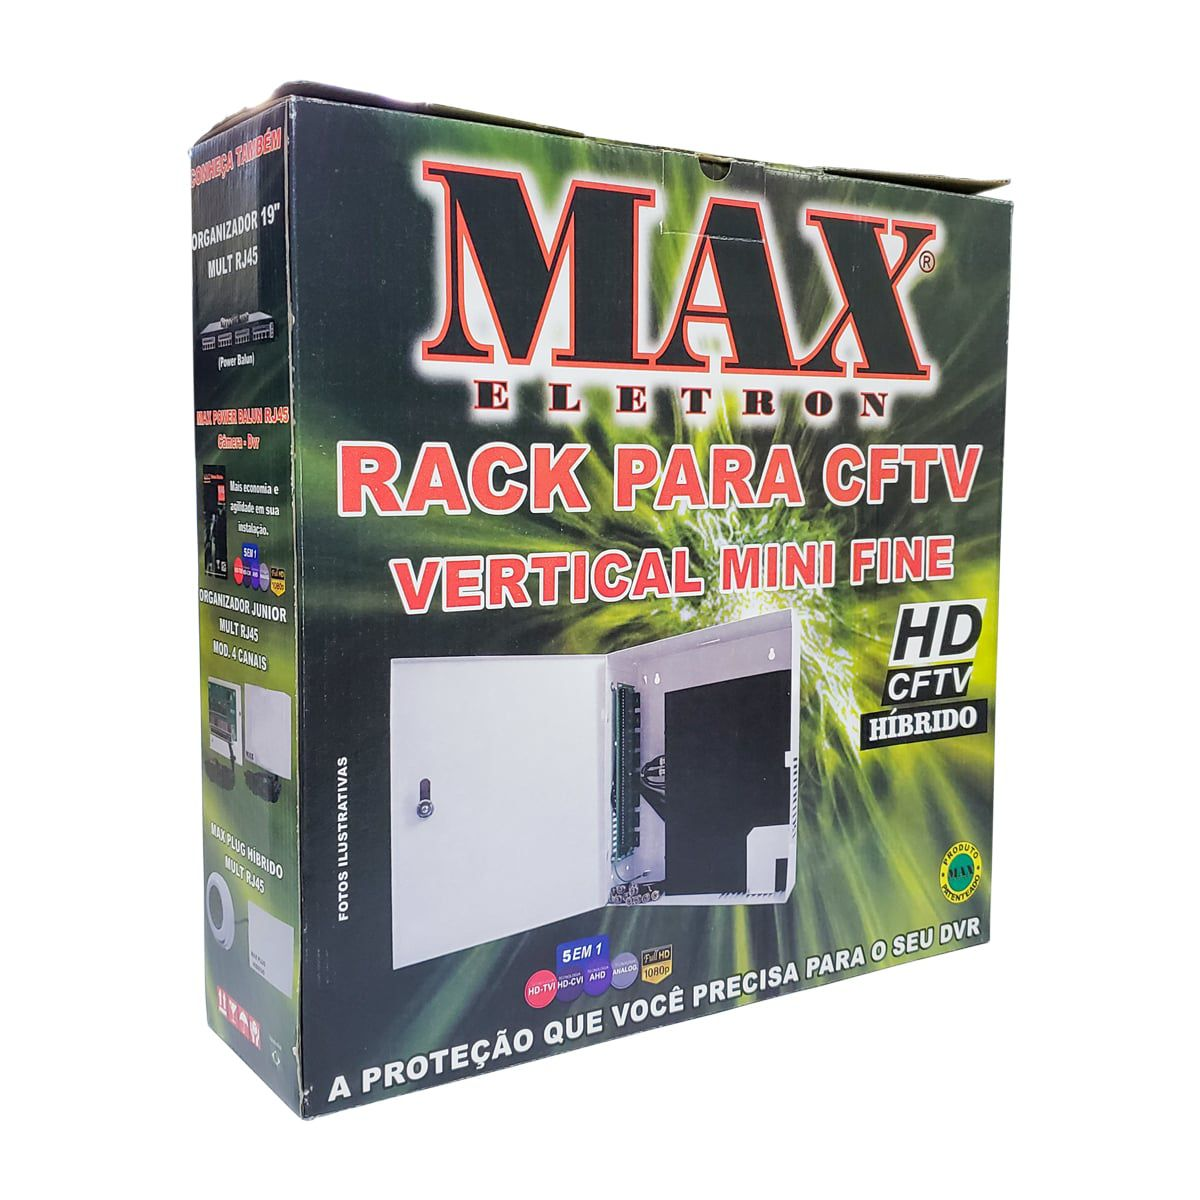 PÁSCOA CFTV CLUBE - Rack Vertical Fine c/ Placa Eletrônica 4 Canais Max Eletron  - CFTV Clube | Brasil